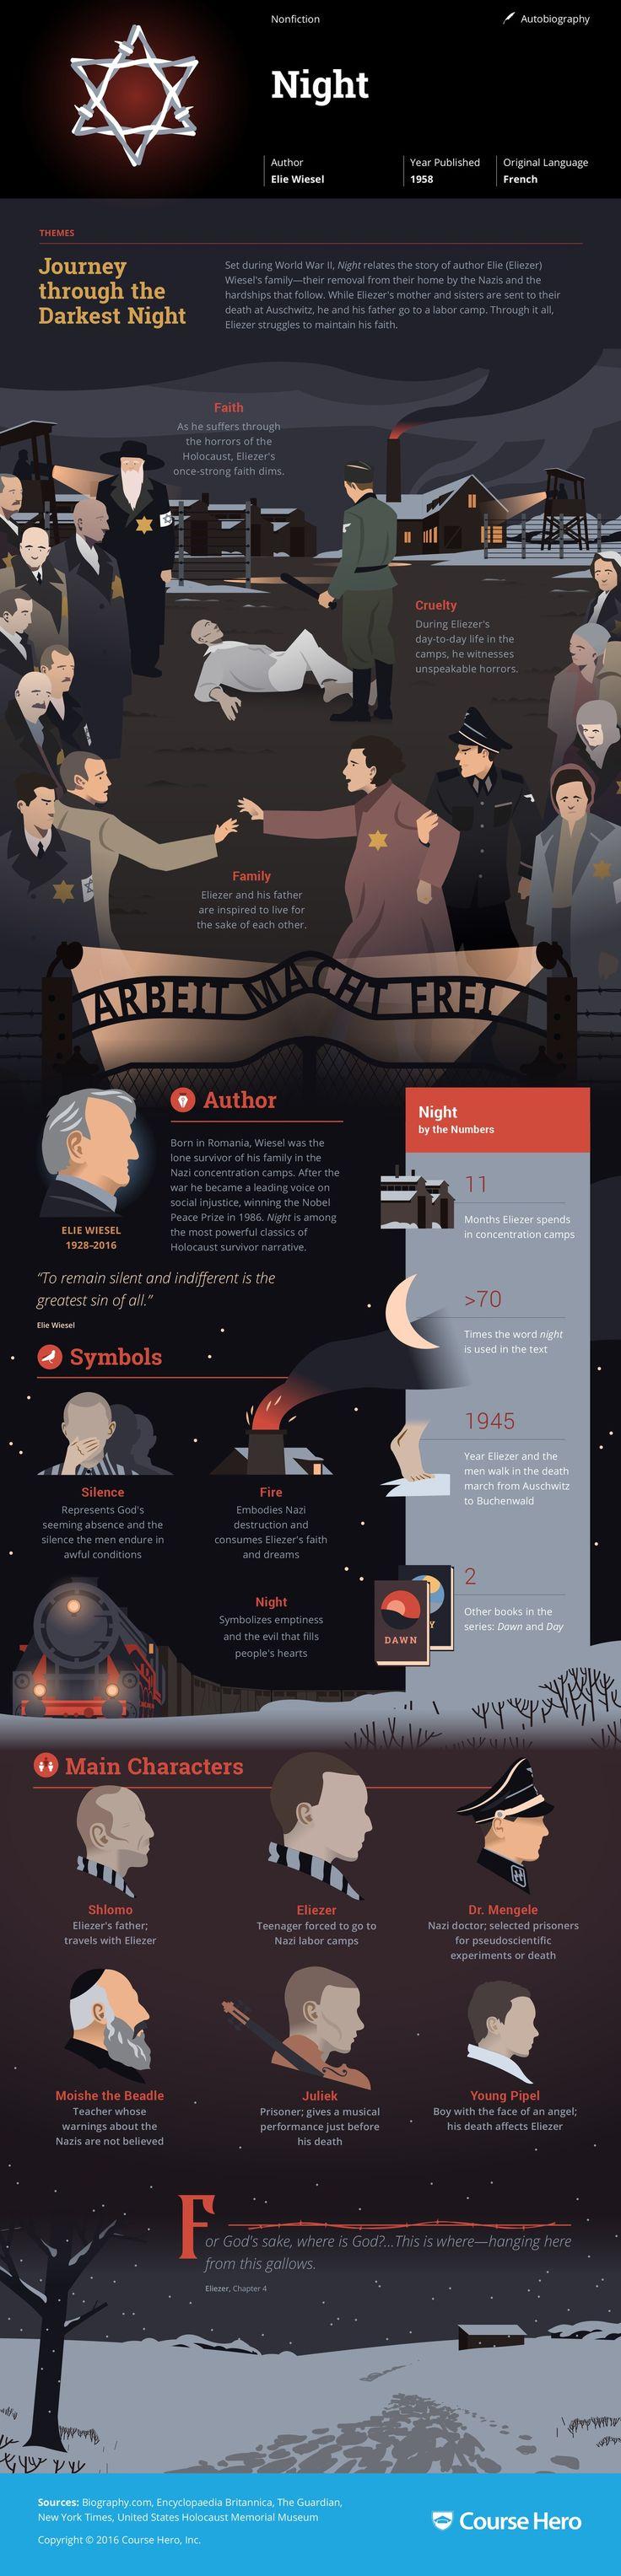 Night Infographic | Course Hero